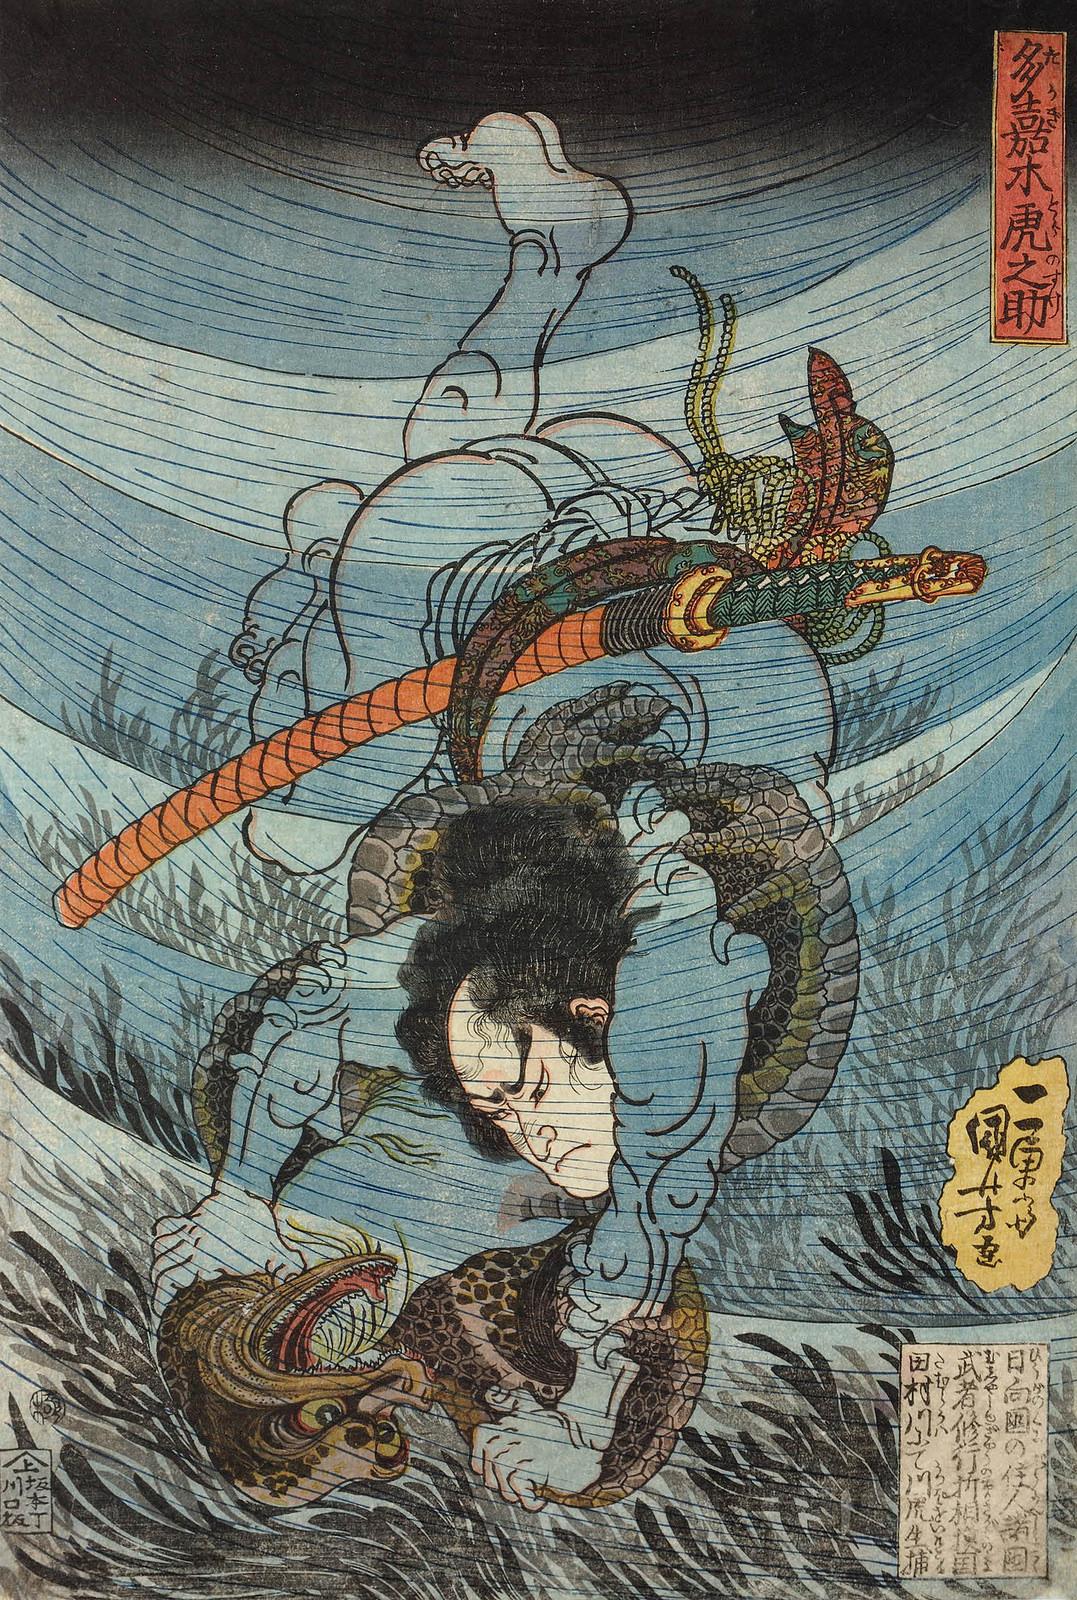 akagi Toranosuke capturing a kappa under the water in the Tamura river in the province of Sagami. Edo Period